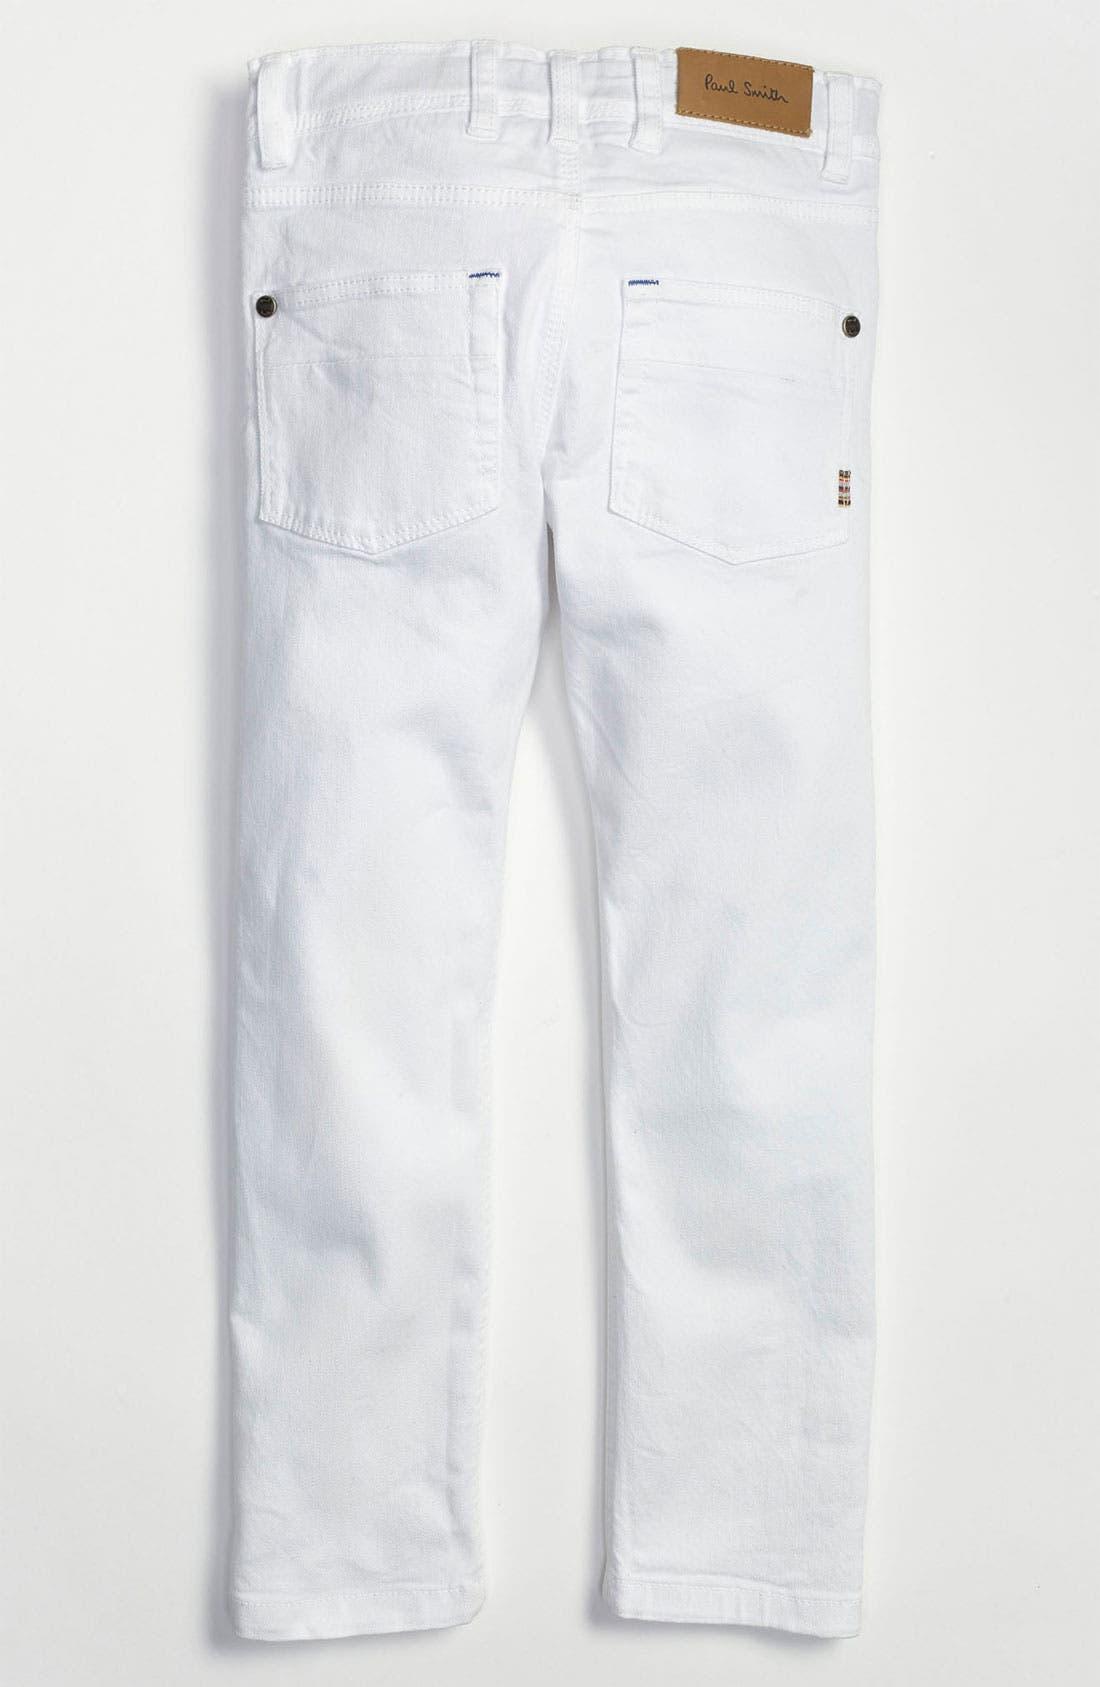 Alternate Image 1 Selected - Paul Smith Junior 'Doug' Slim Fit Pants (Little Boys & Big Boys)